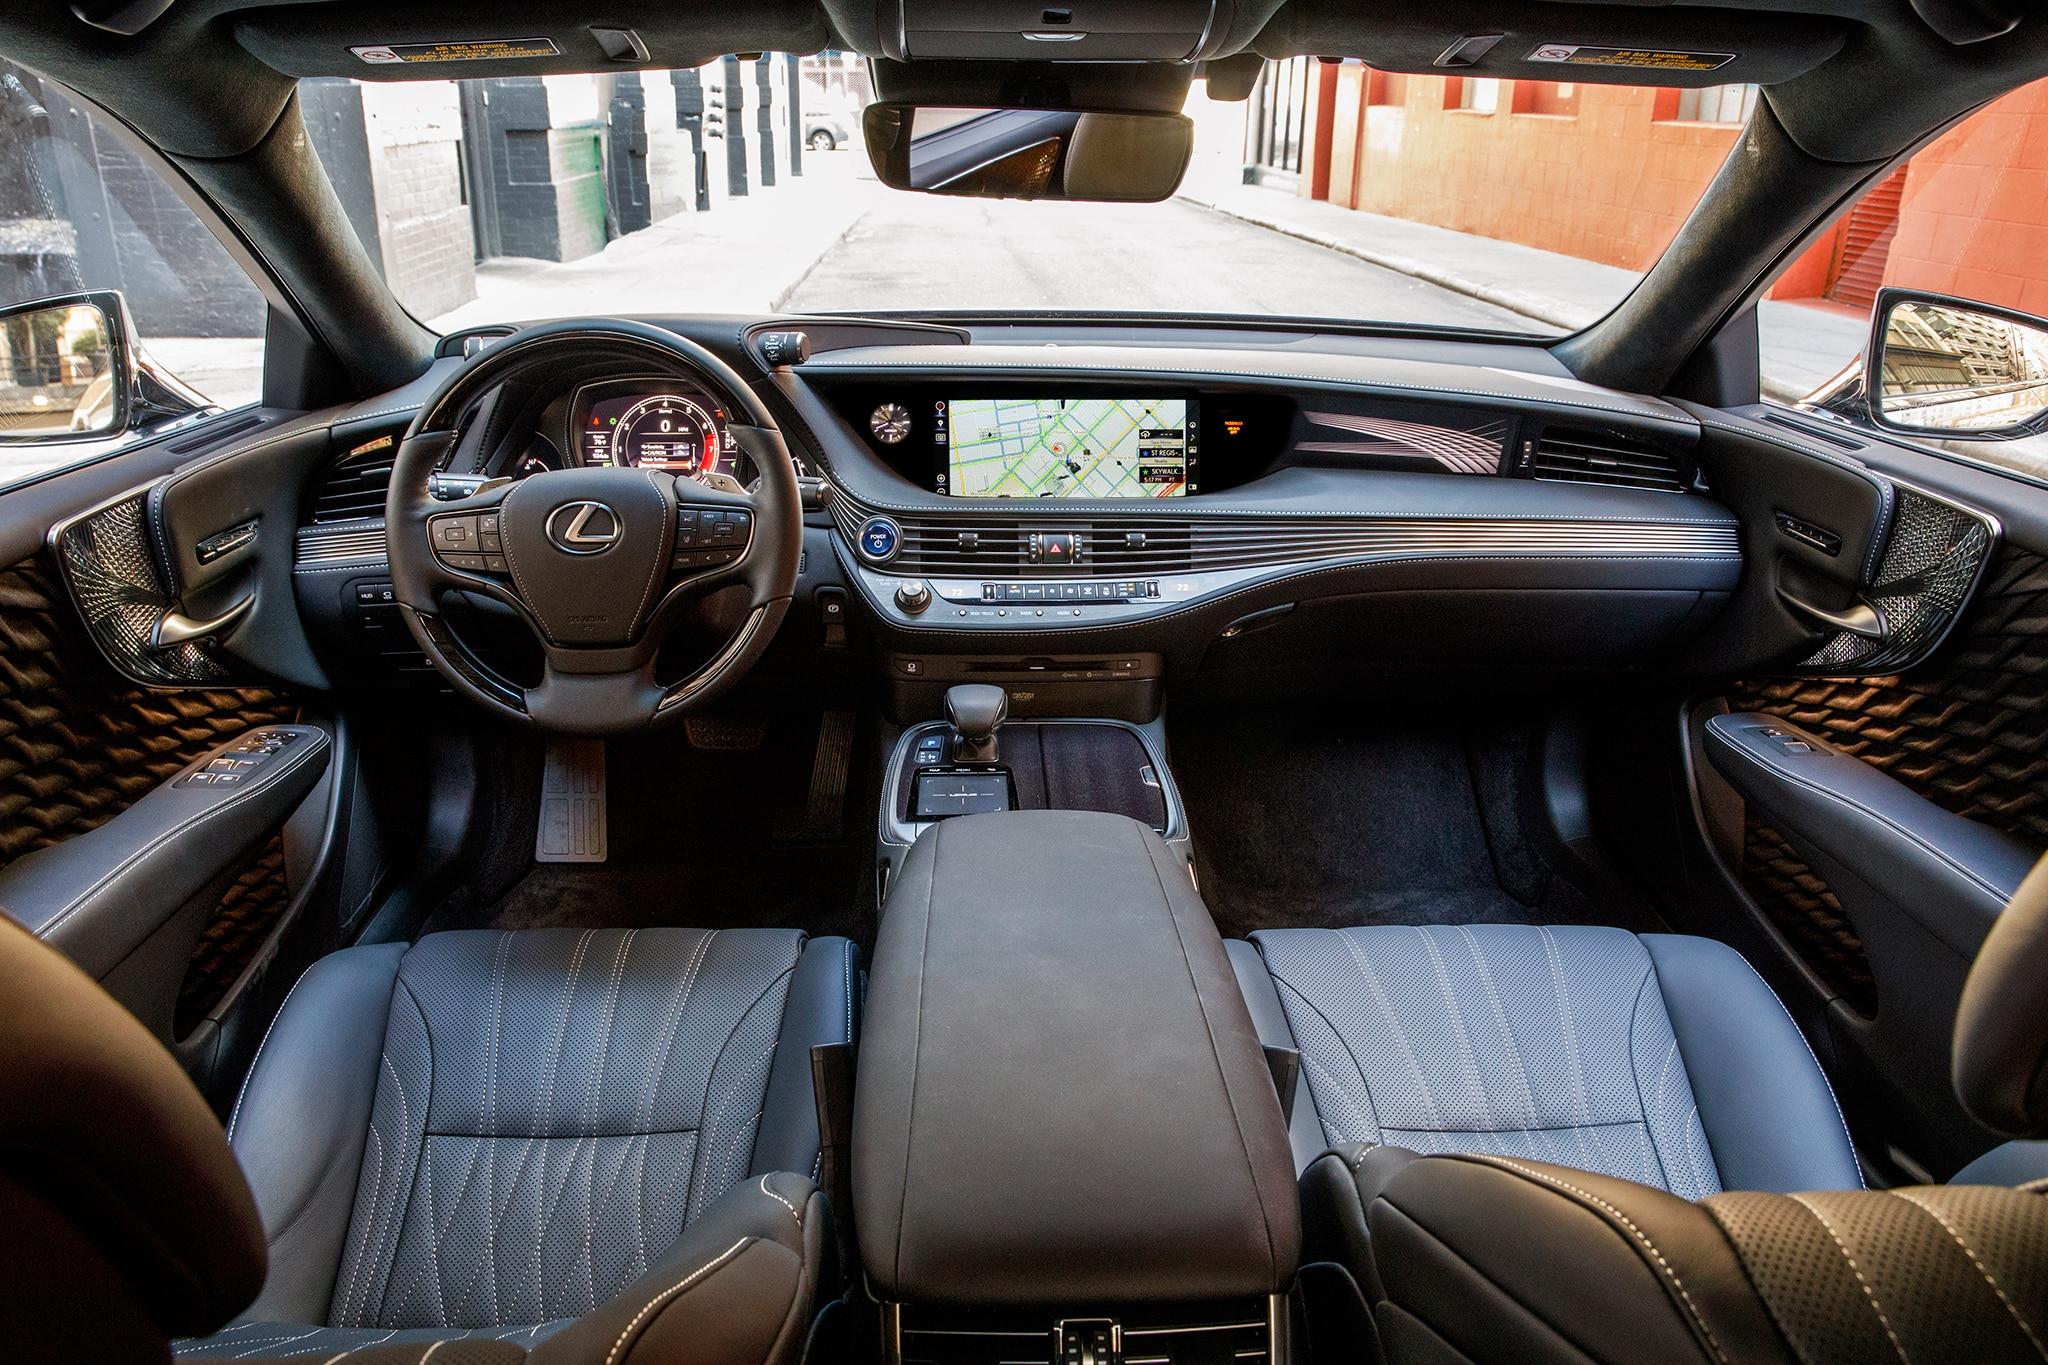 https://st.automobilemag.com/uploads/sites/11/2017/09/2018-Lexus-LS-500h-cabin-01.jpg